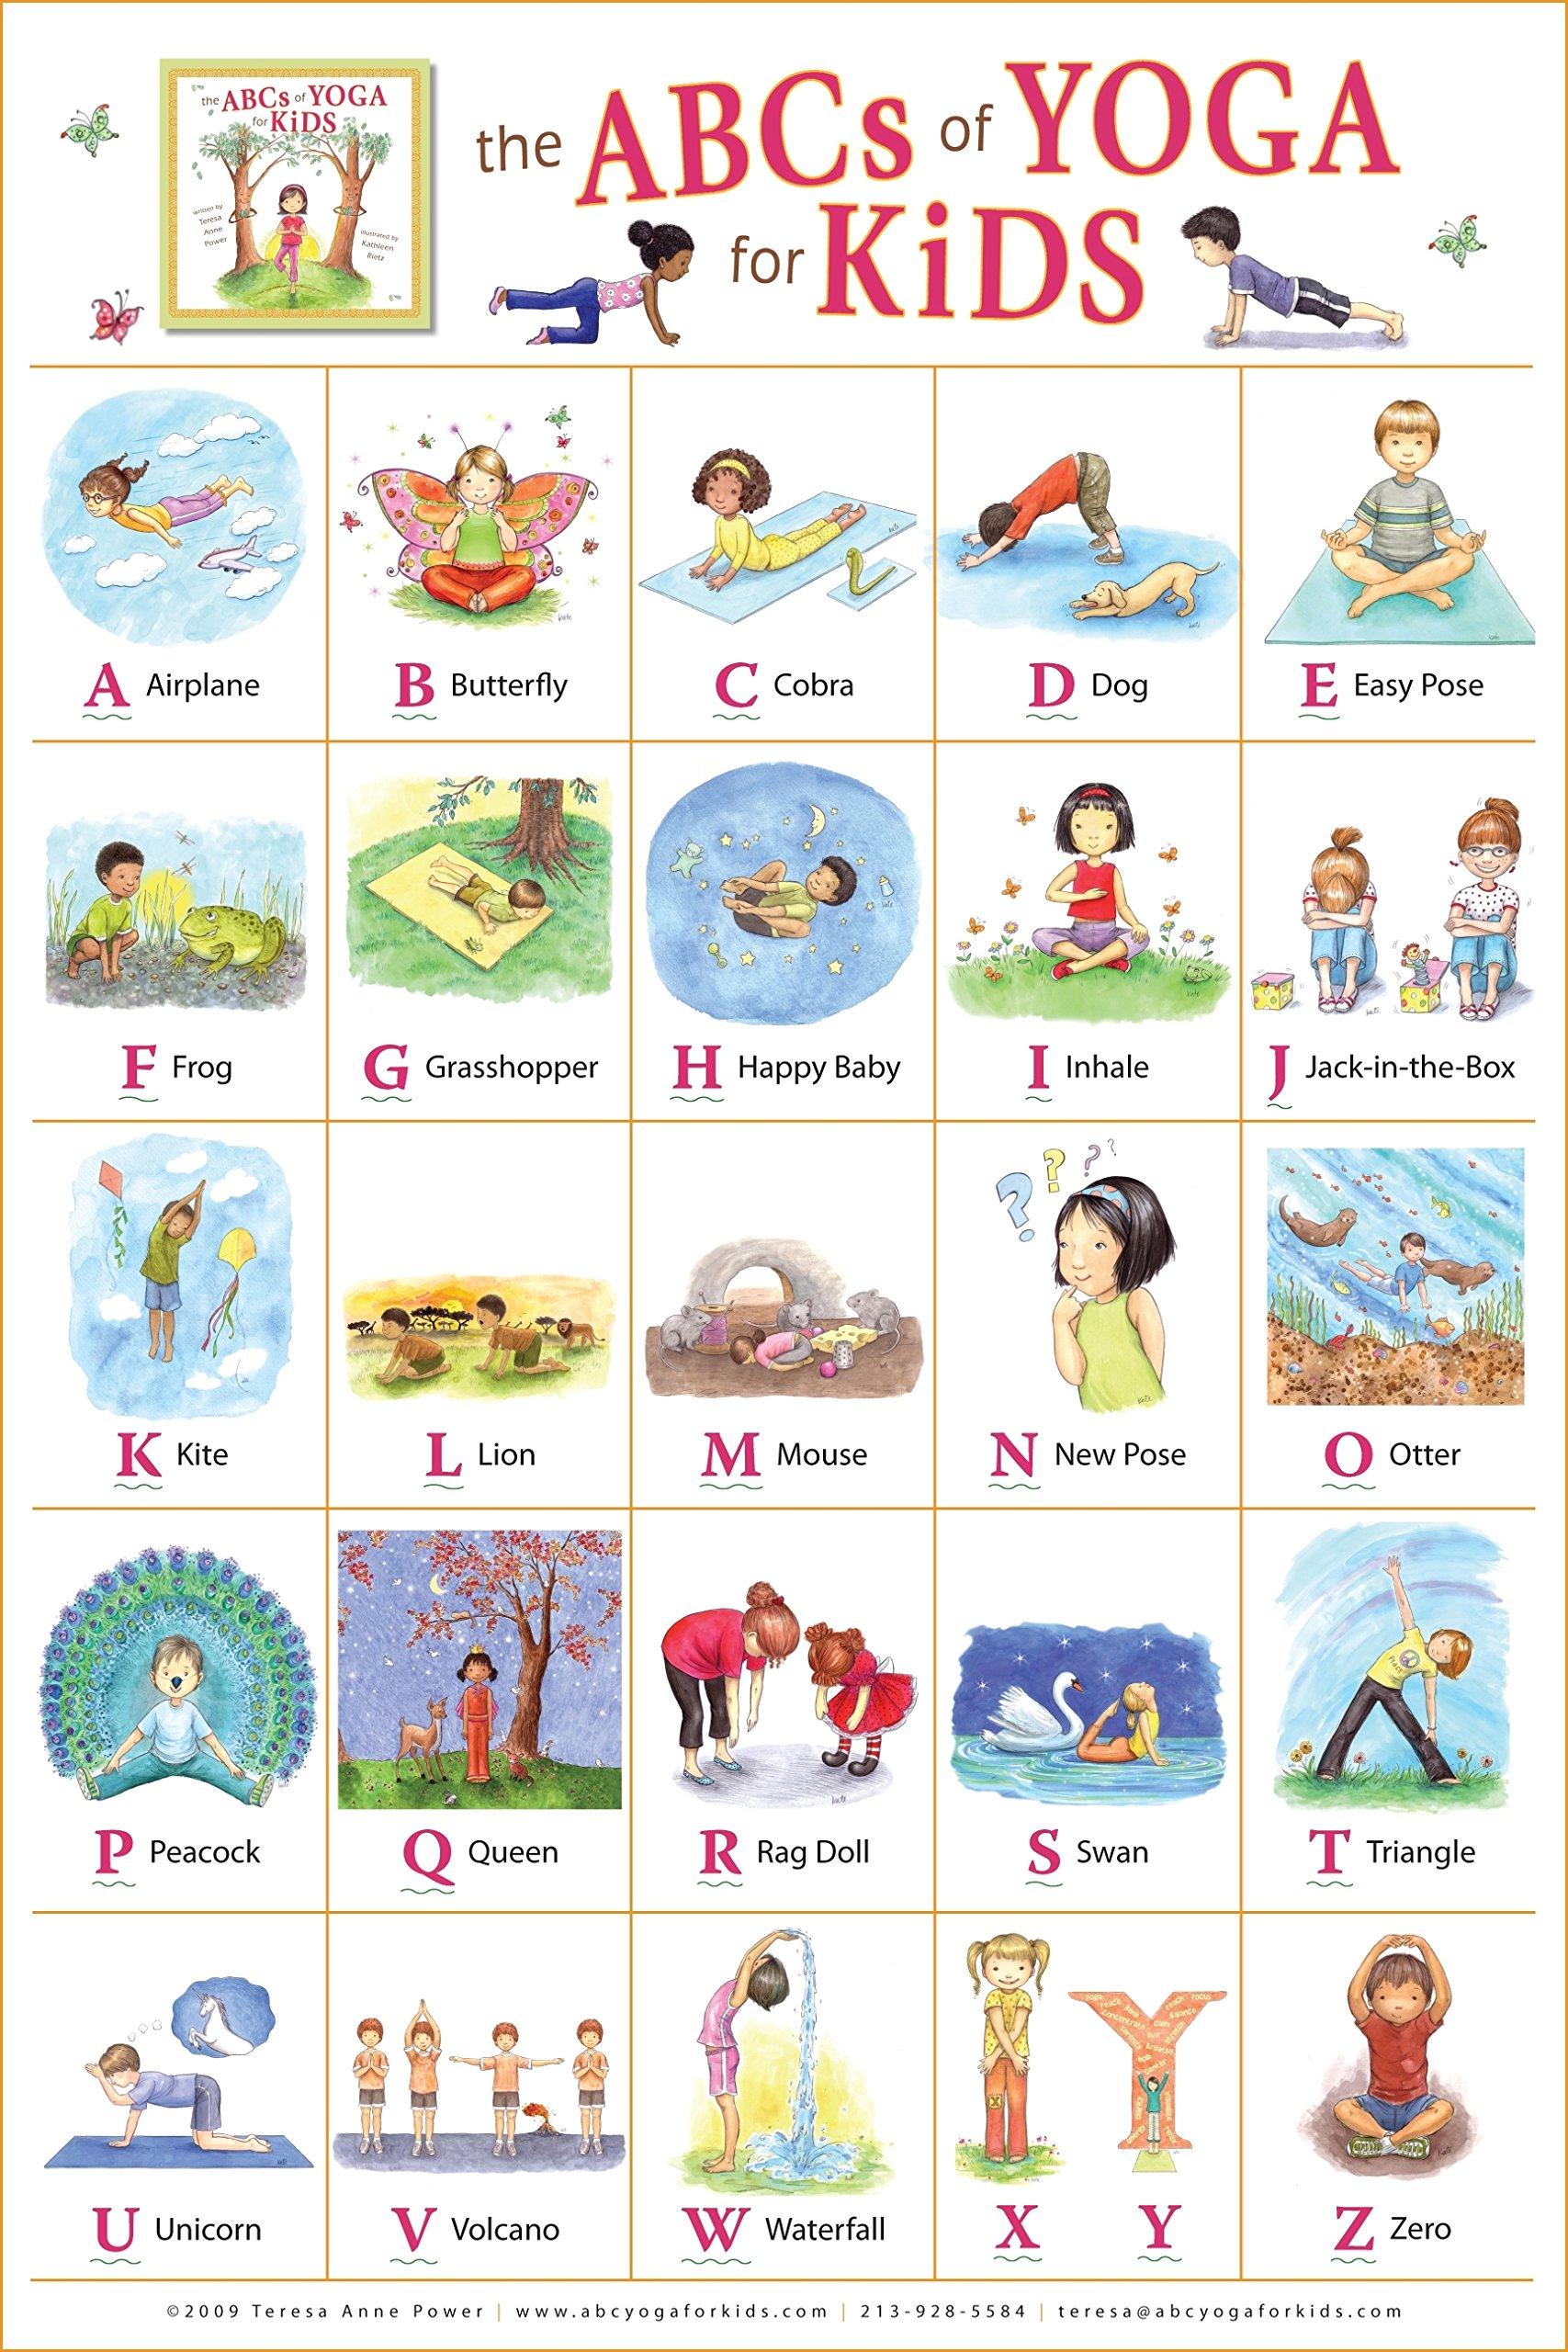 10 Adorable Kids' Yoga Products - via emmiscott.com